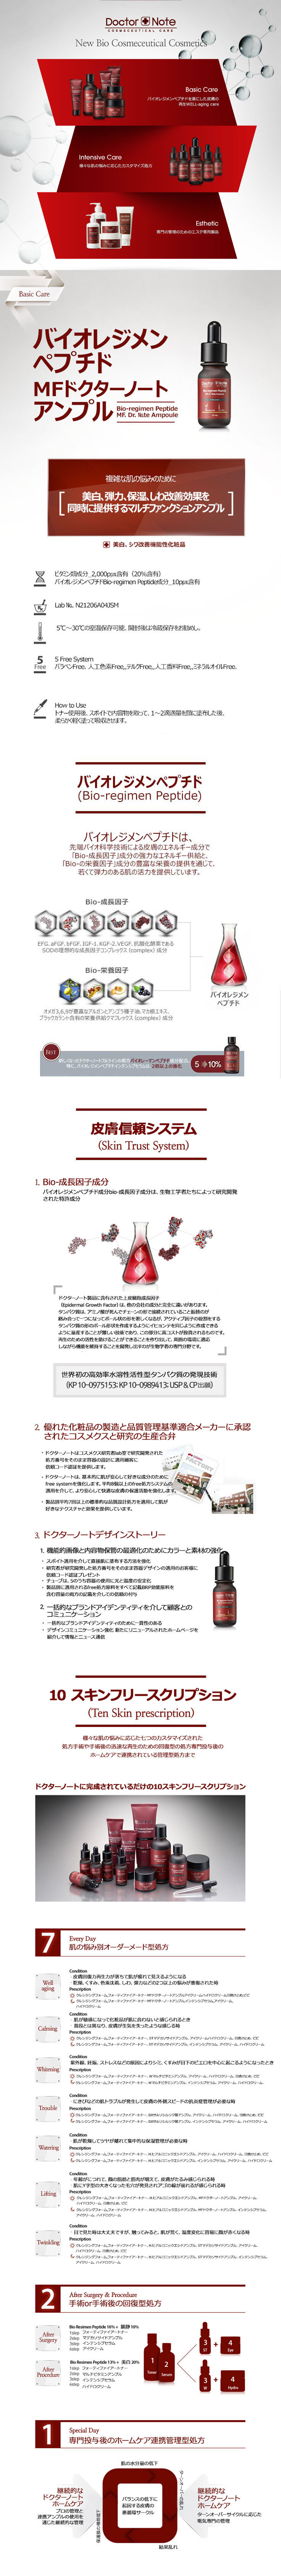 info_DRN009